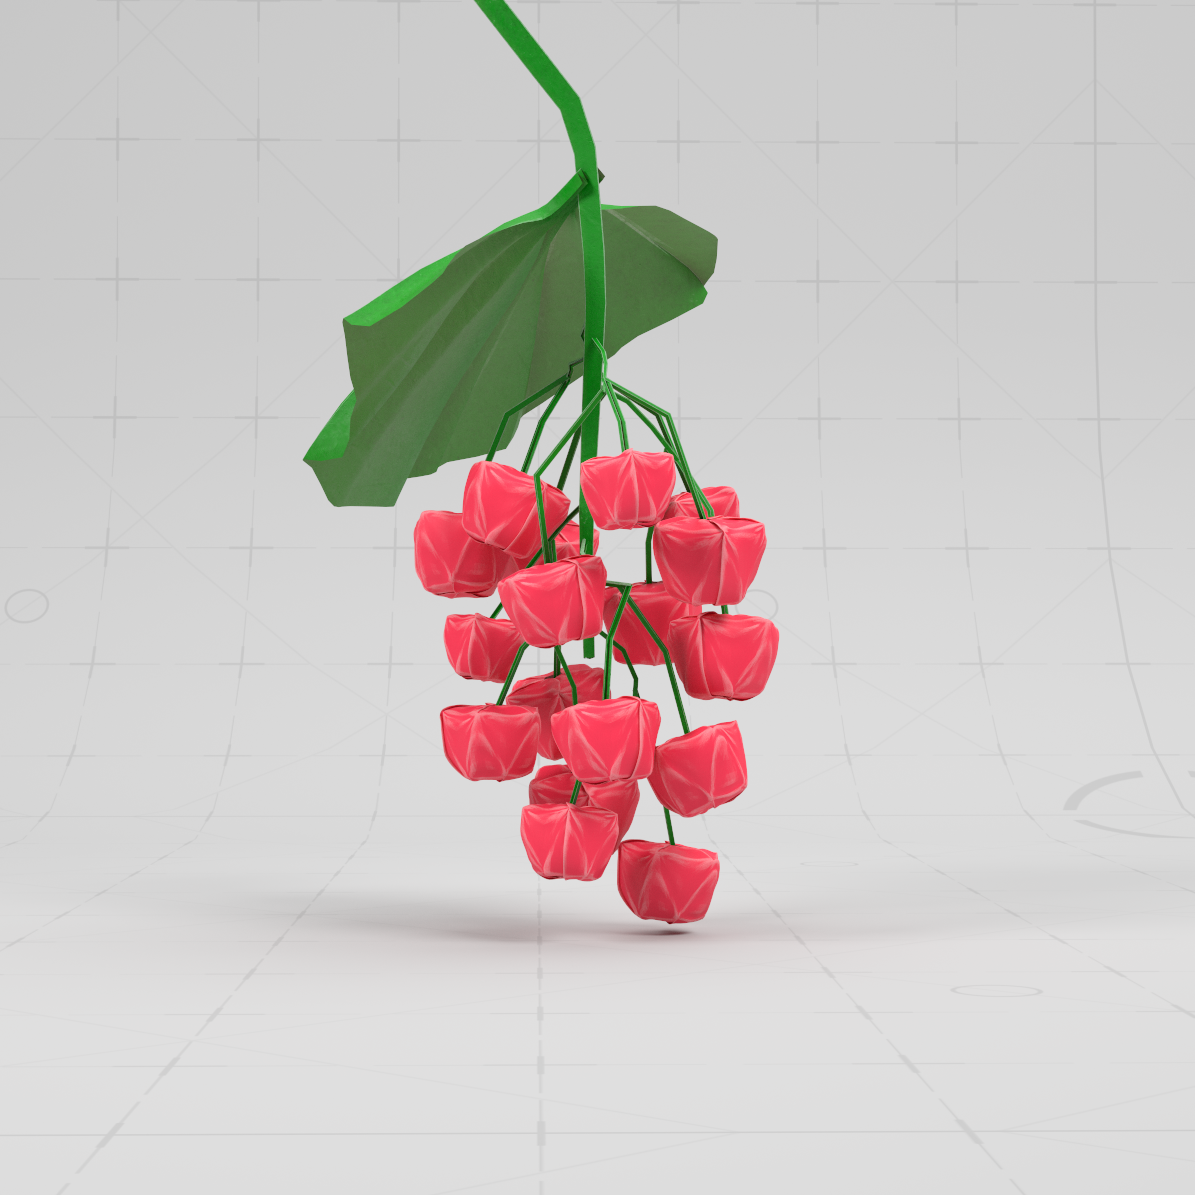 Cherries_v003.png